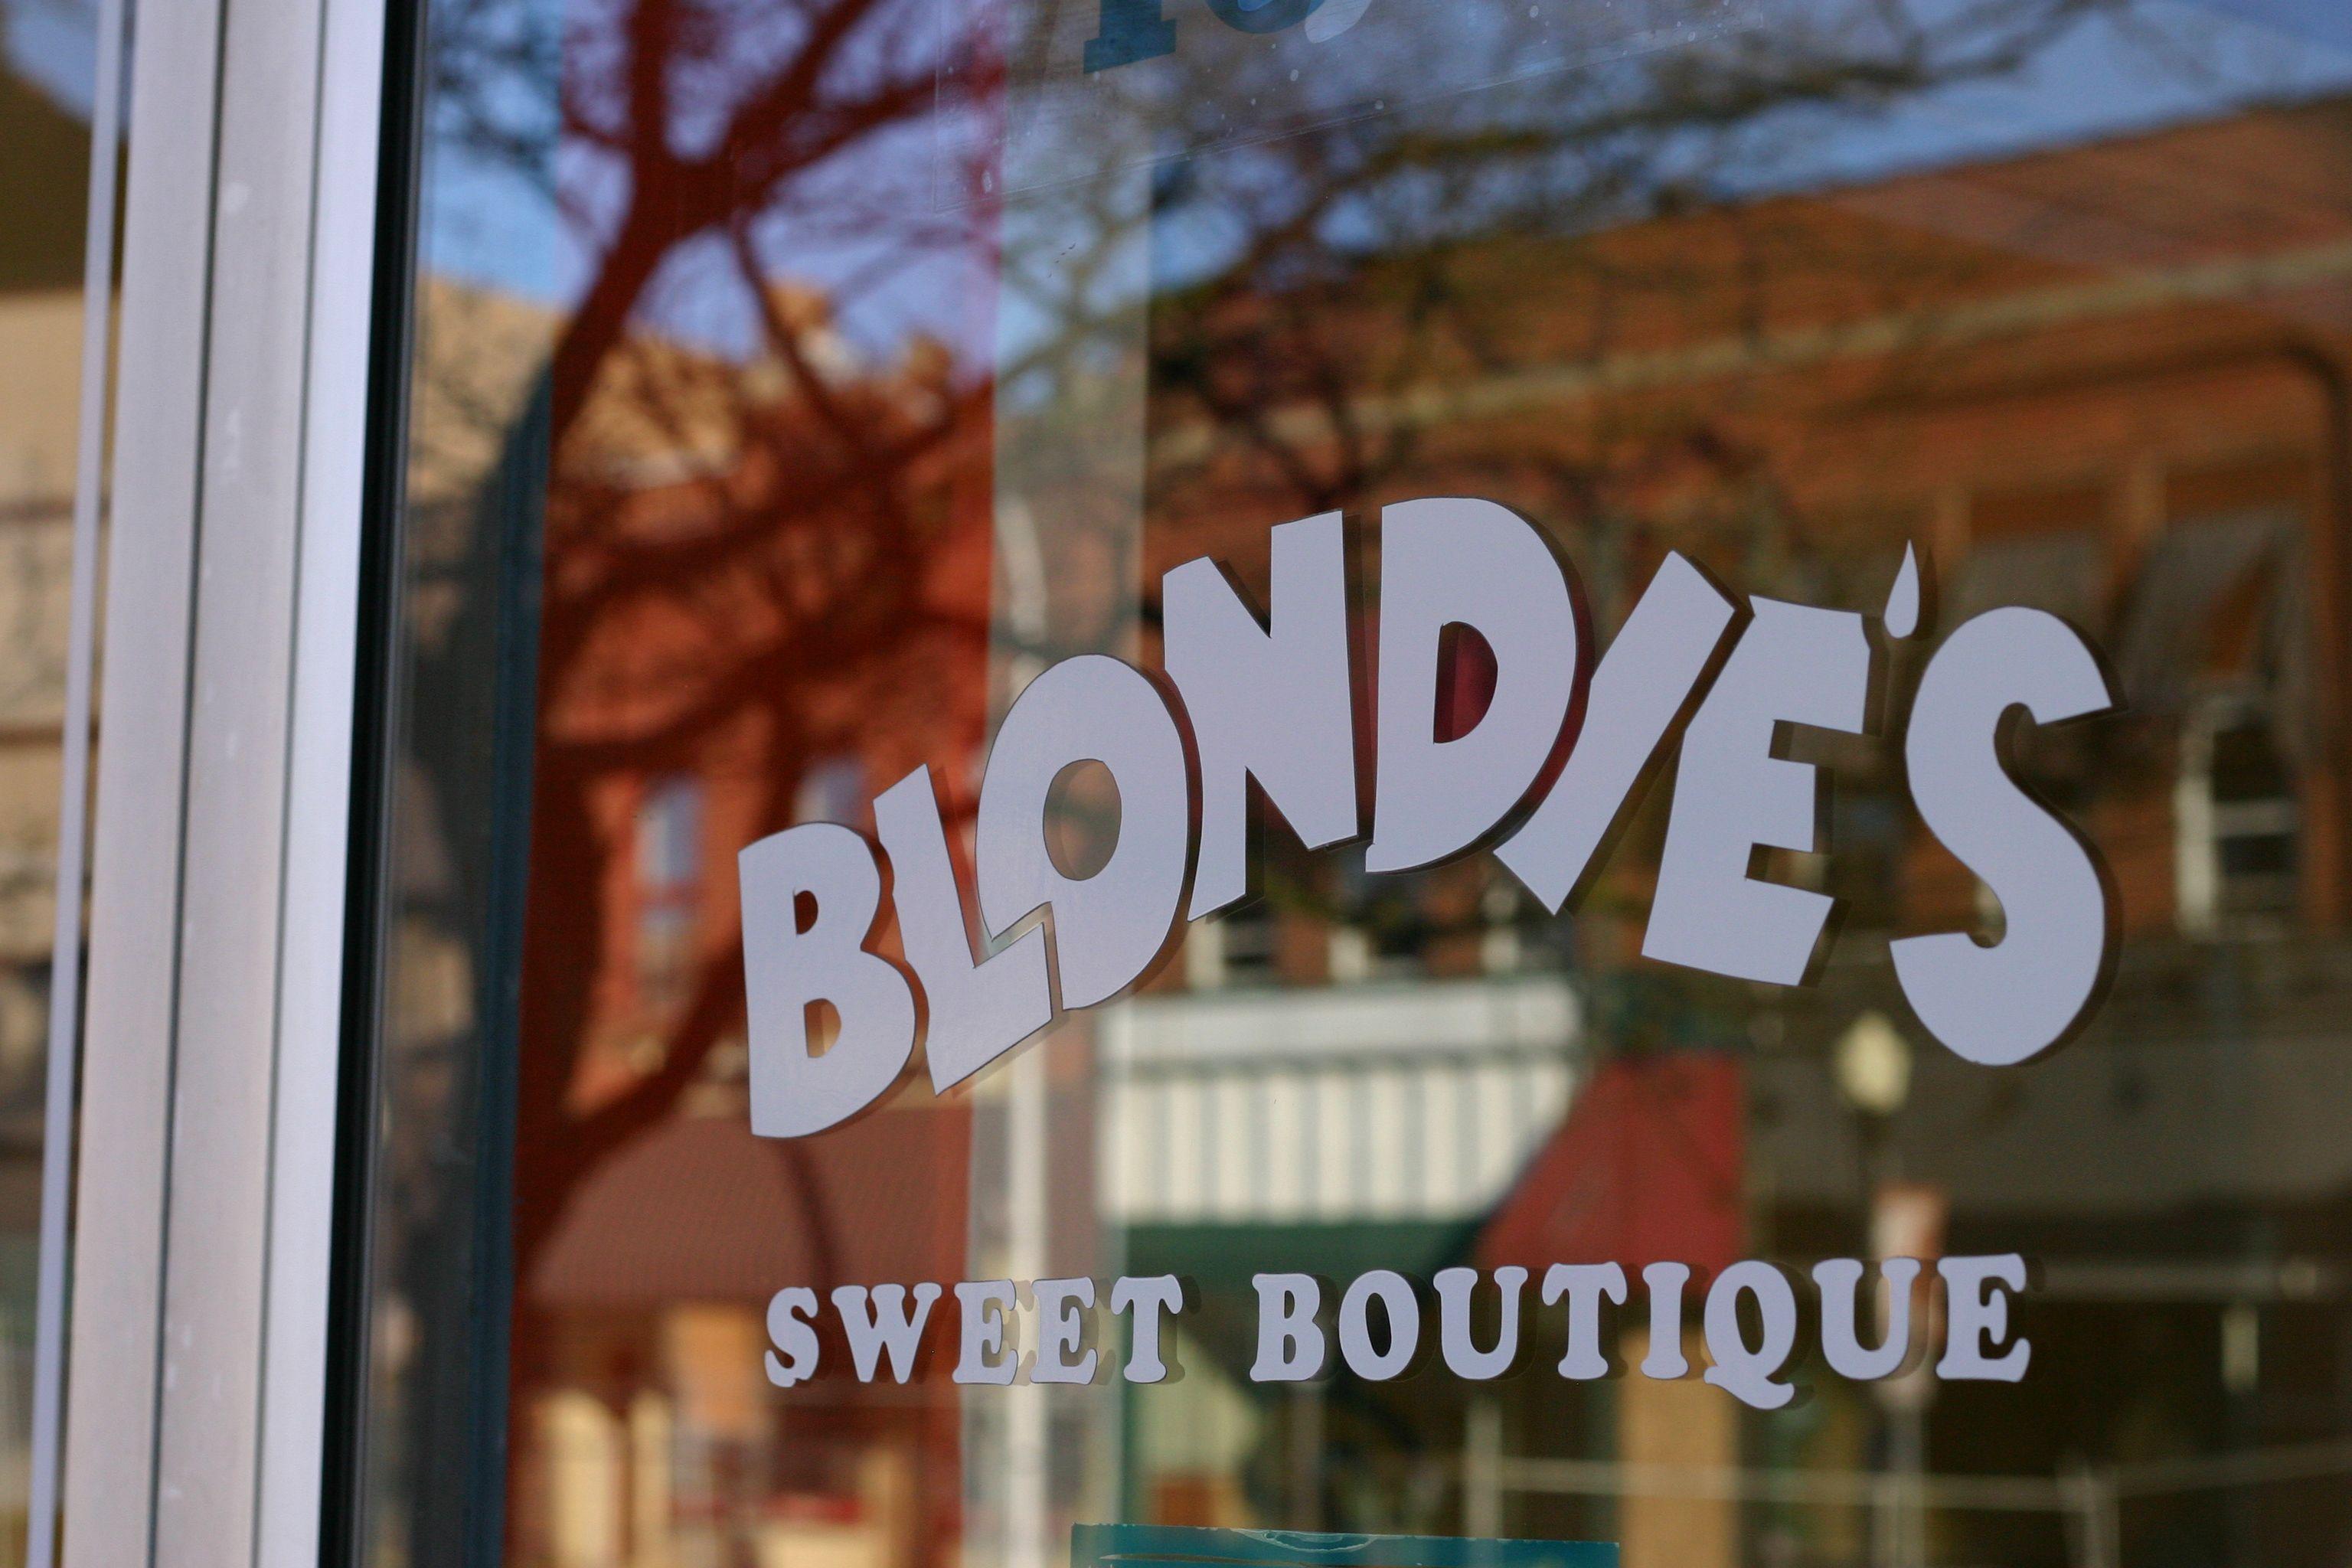 Blondie's Sweet Boutique Nostalgic Candy Lapeer Michigan